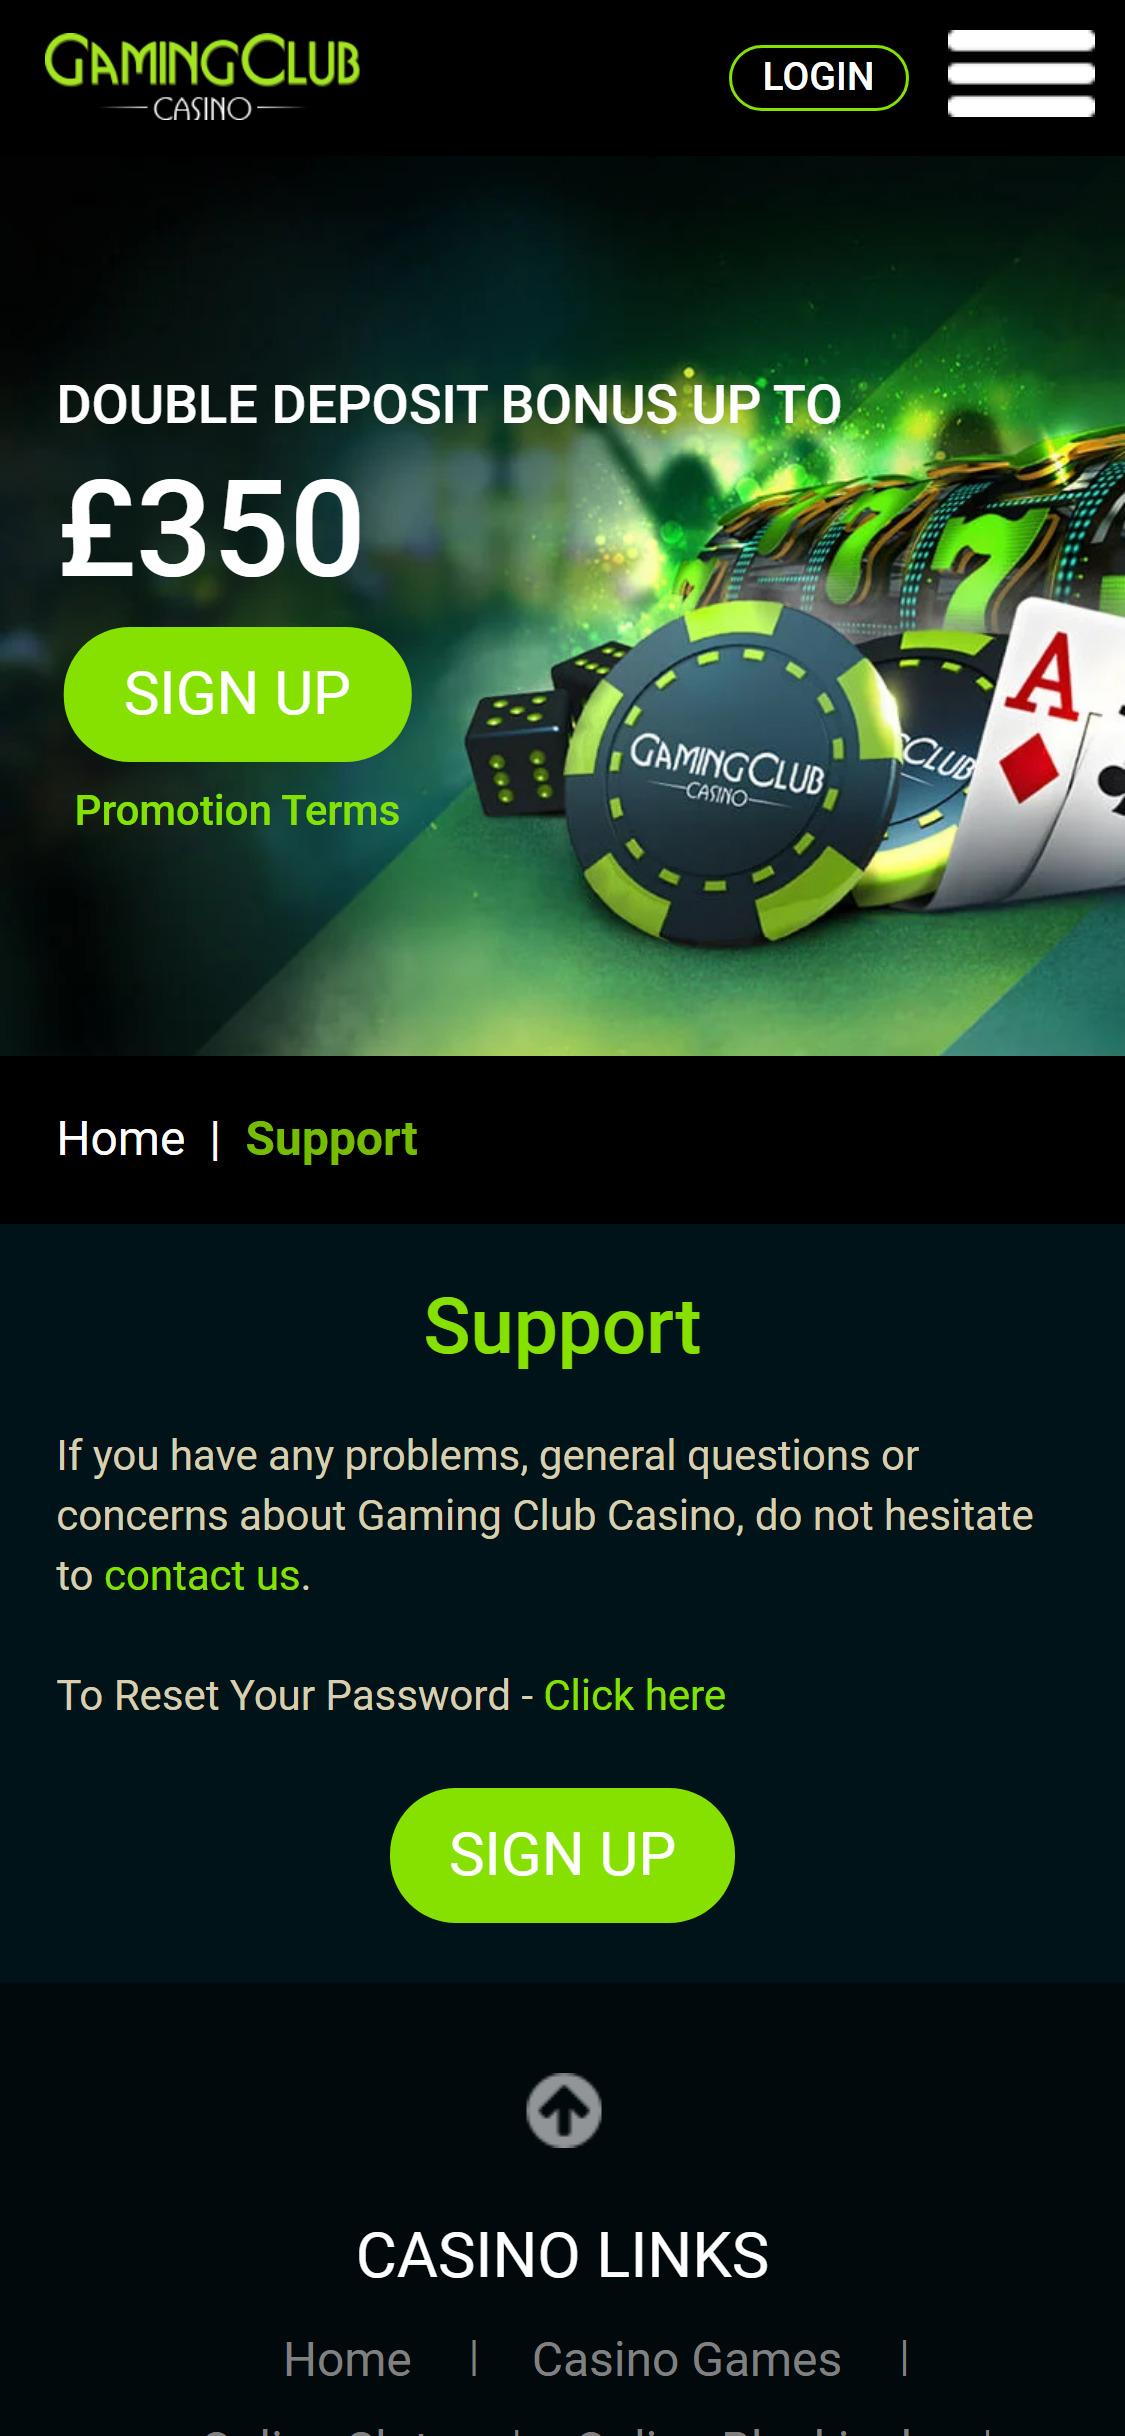 Gamingclub casino para Android 19873